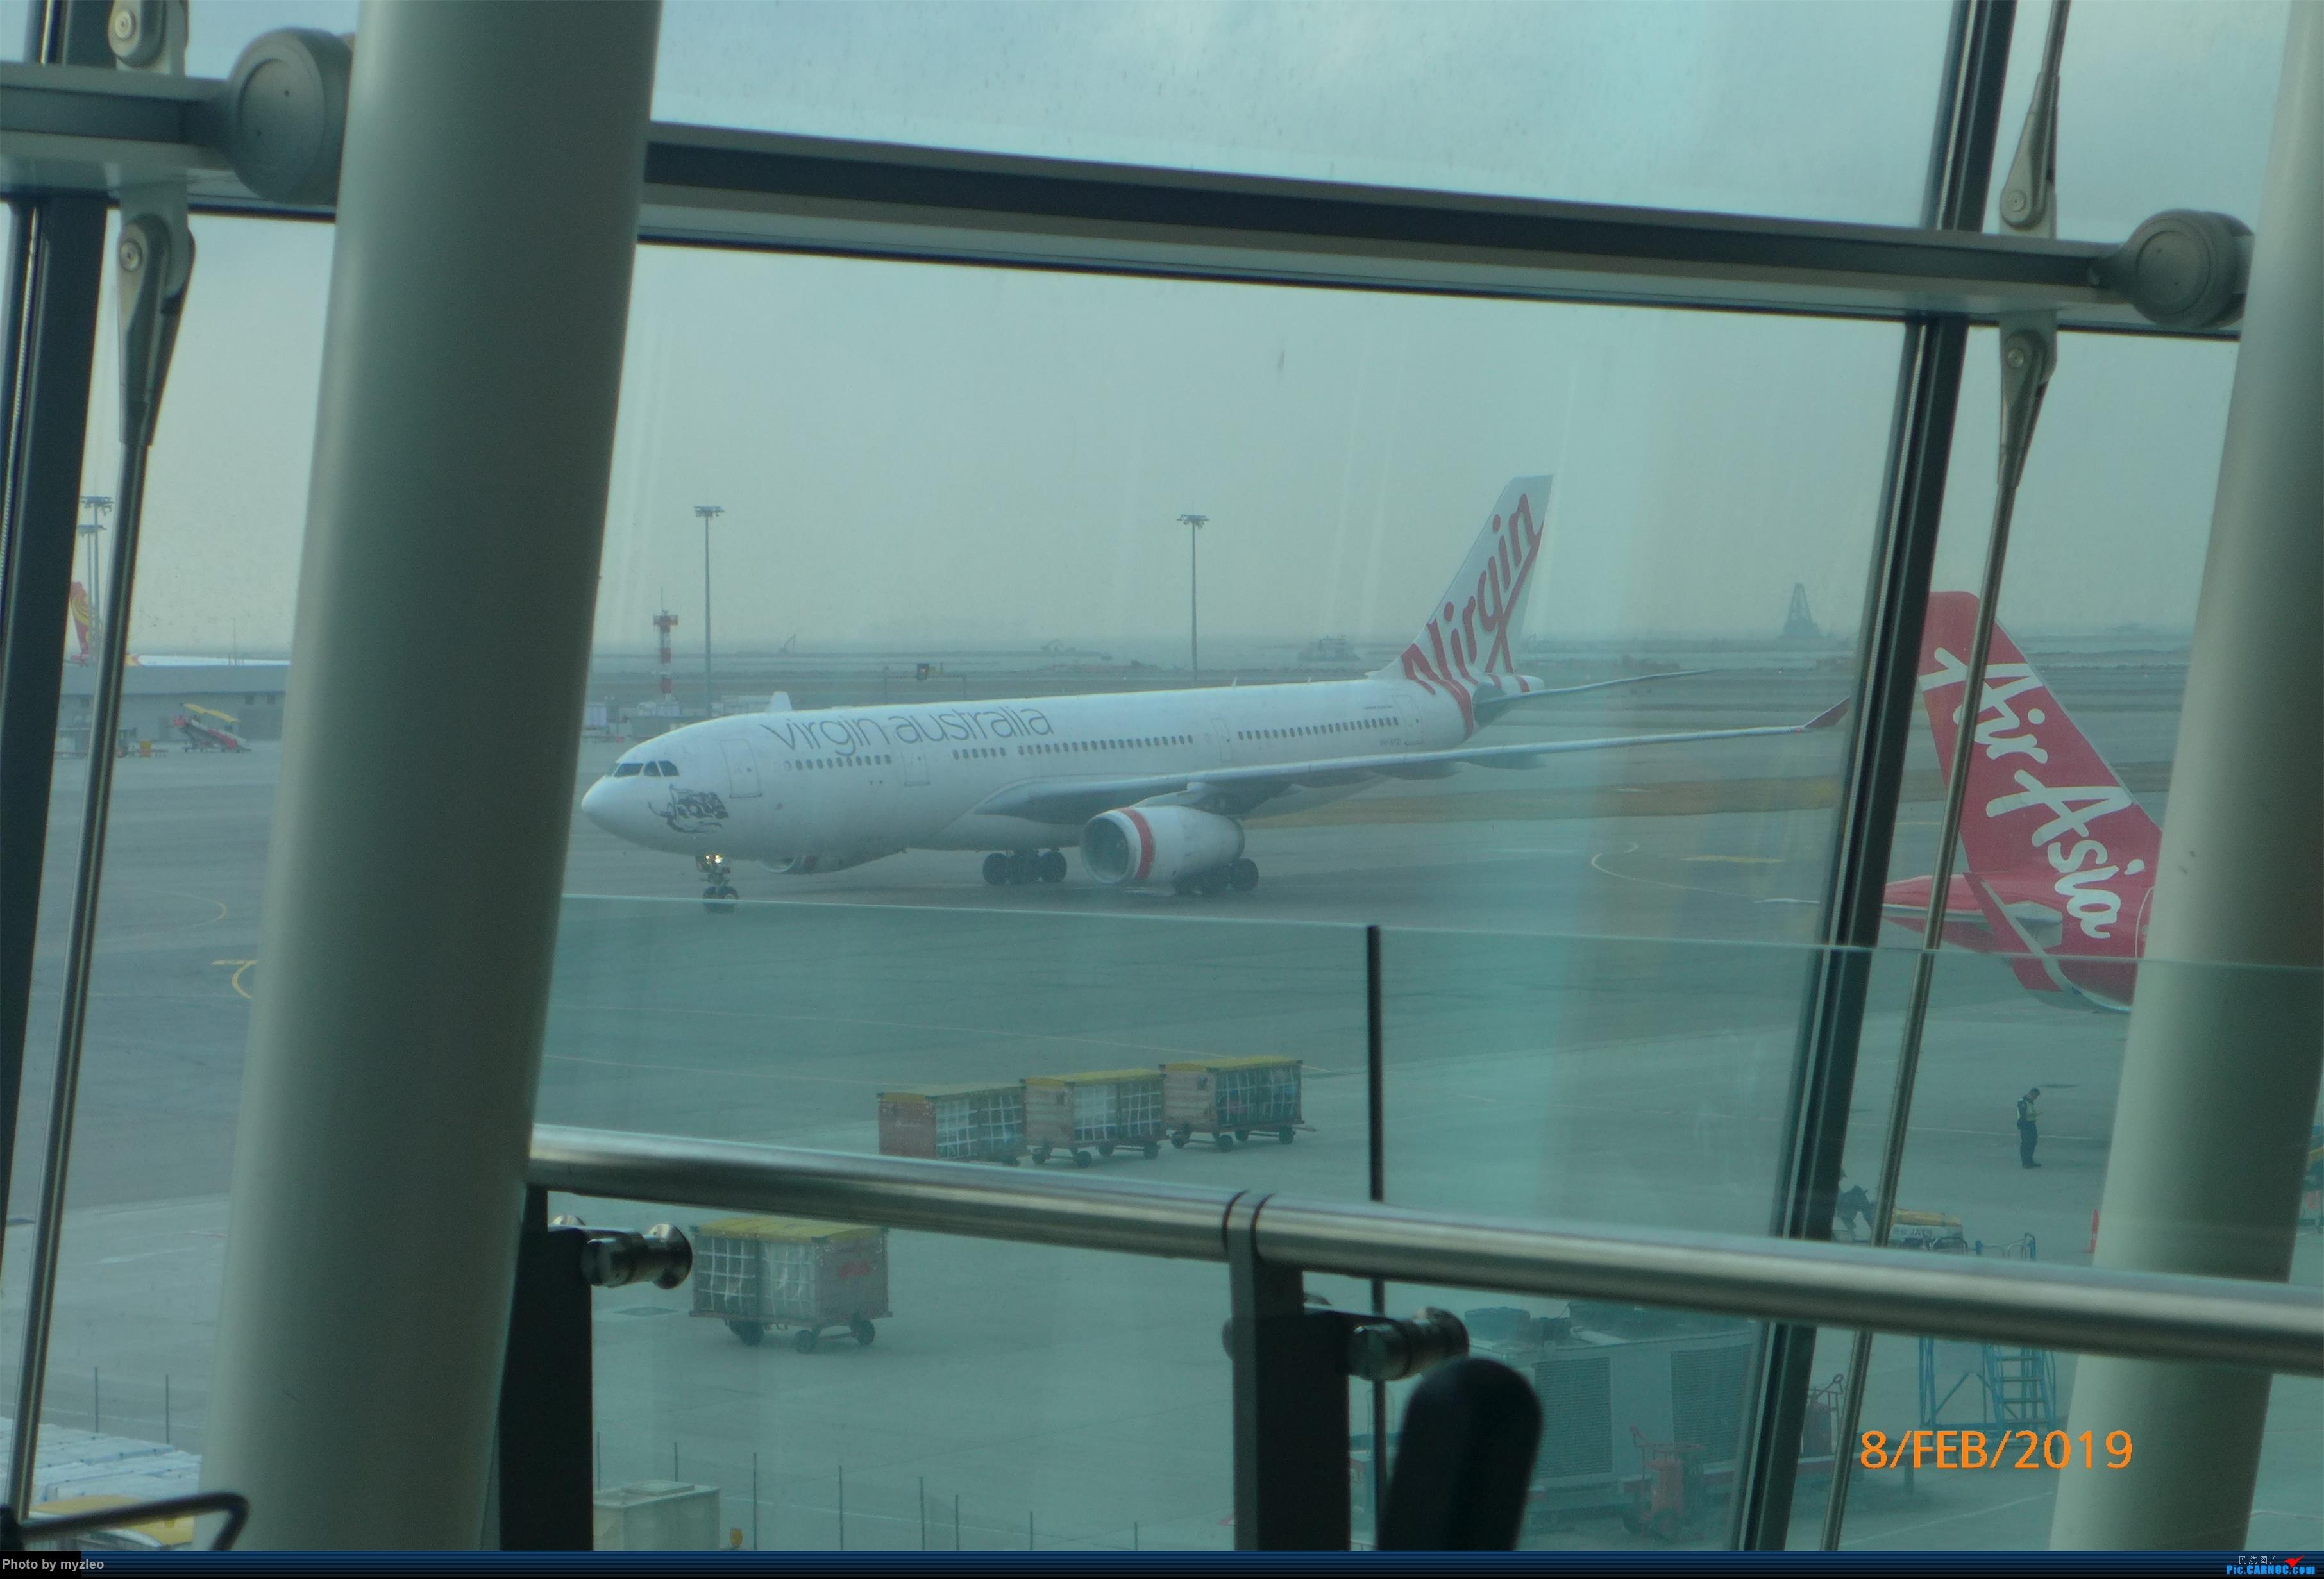 Re:[原创]【myzleo的游记4.5】十年之约(5)在香港的最后一天,搭乘港航333回沪 AIRBUS A330-200 VH-XFD 中国香港国际机场